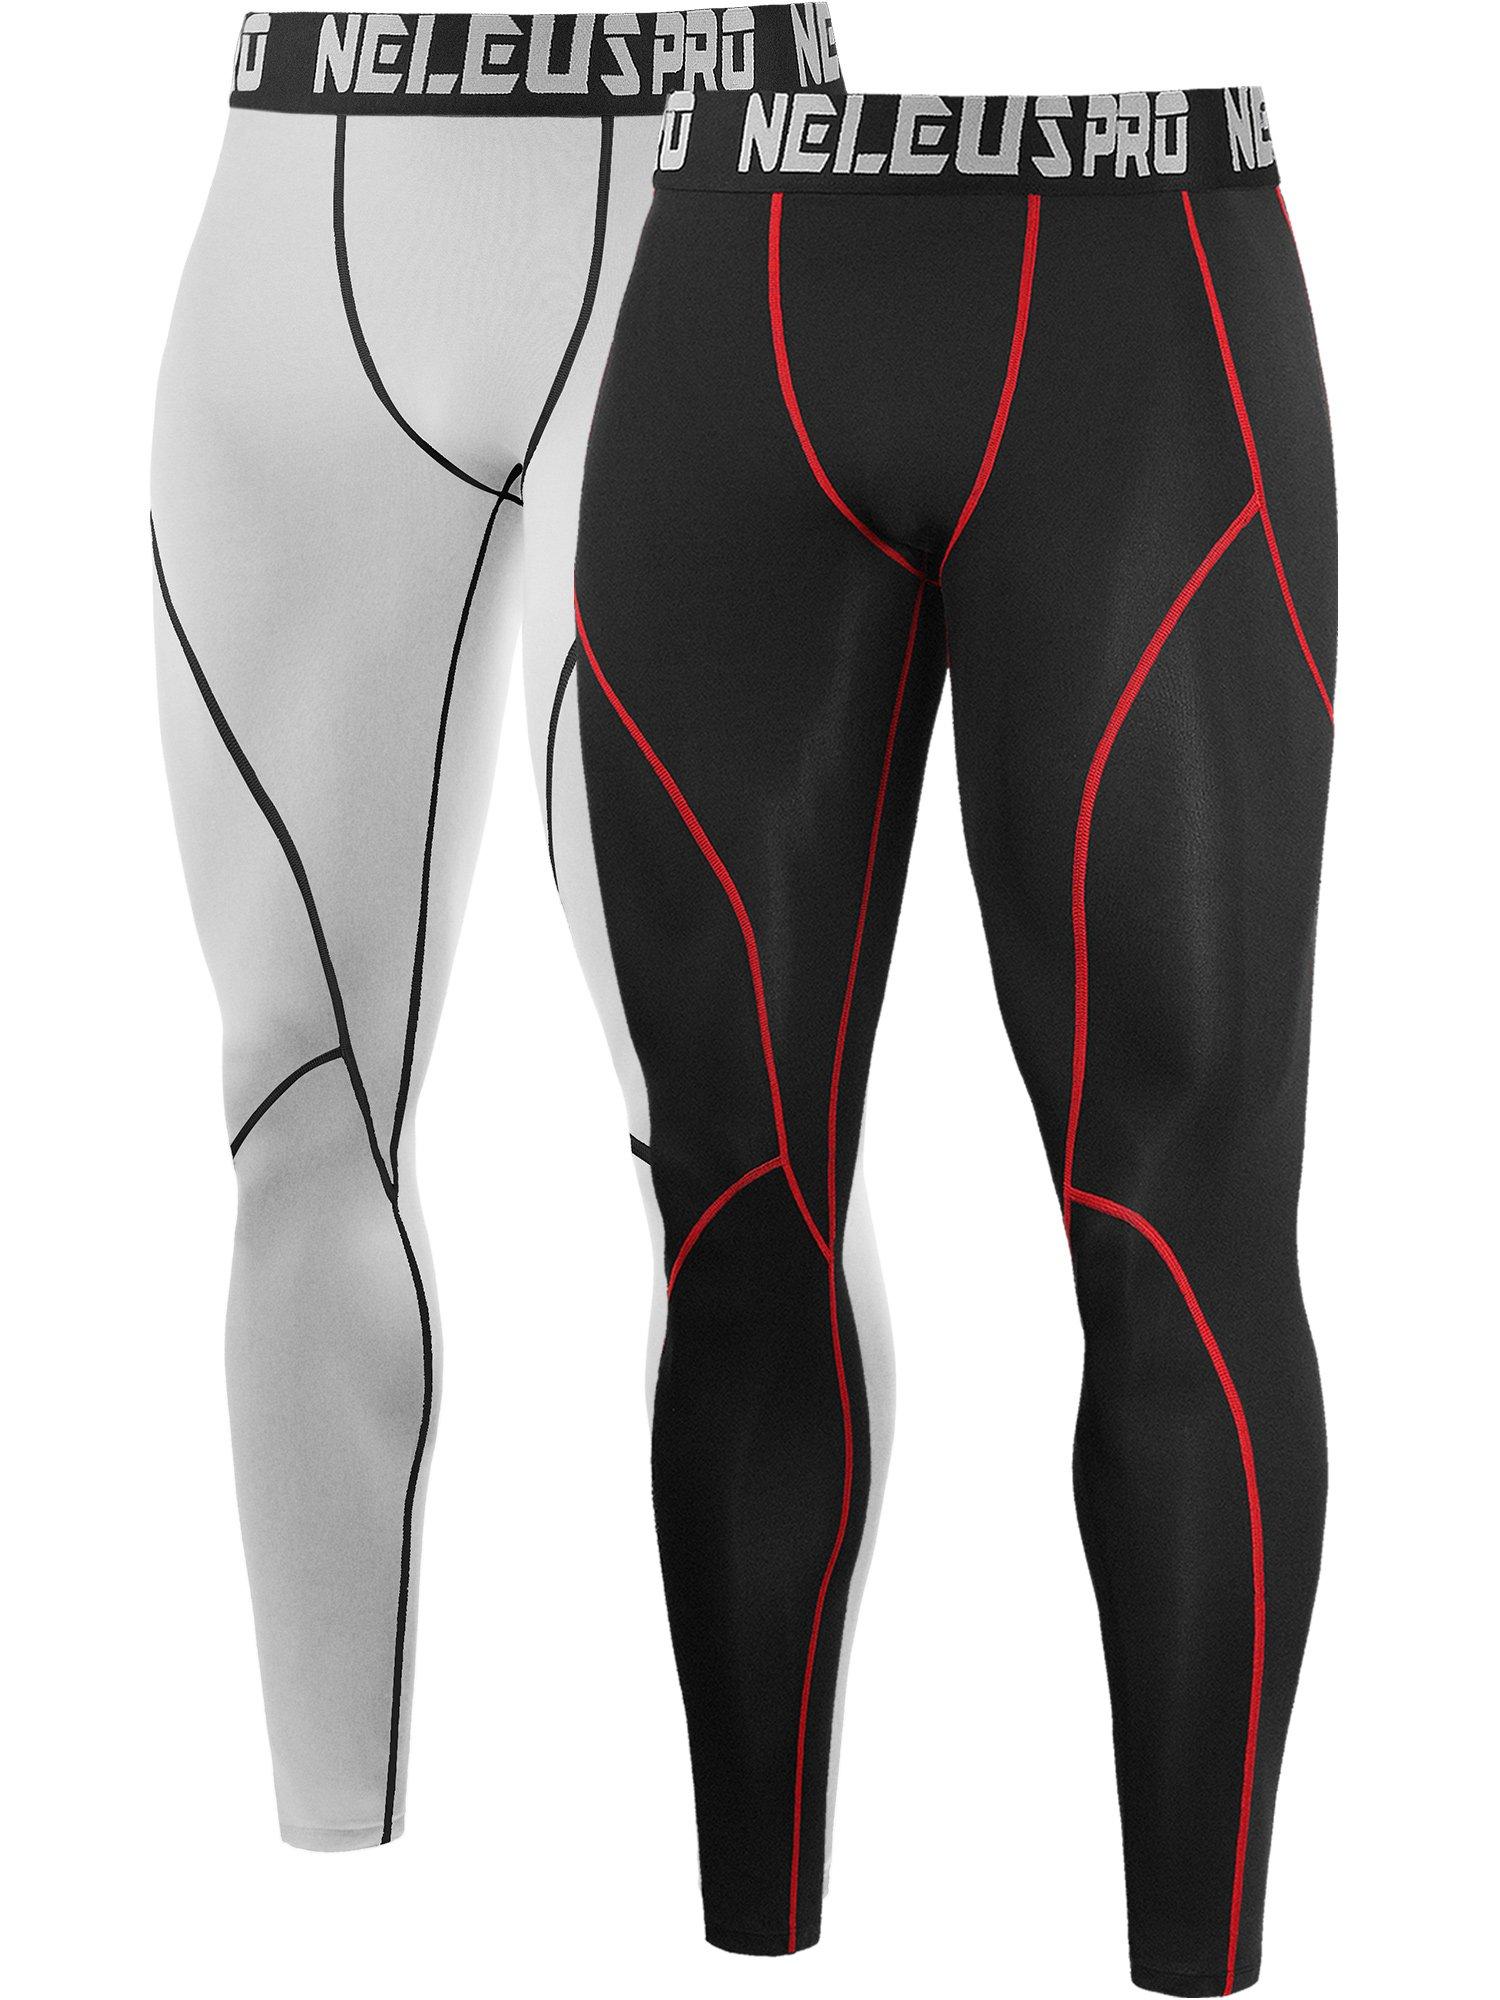 Neleus Men's 2 Pack Compression Pants Workout Running Tights Leggings,6013,Black (Red Stripe),White,US S,EU M